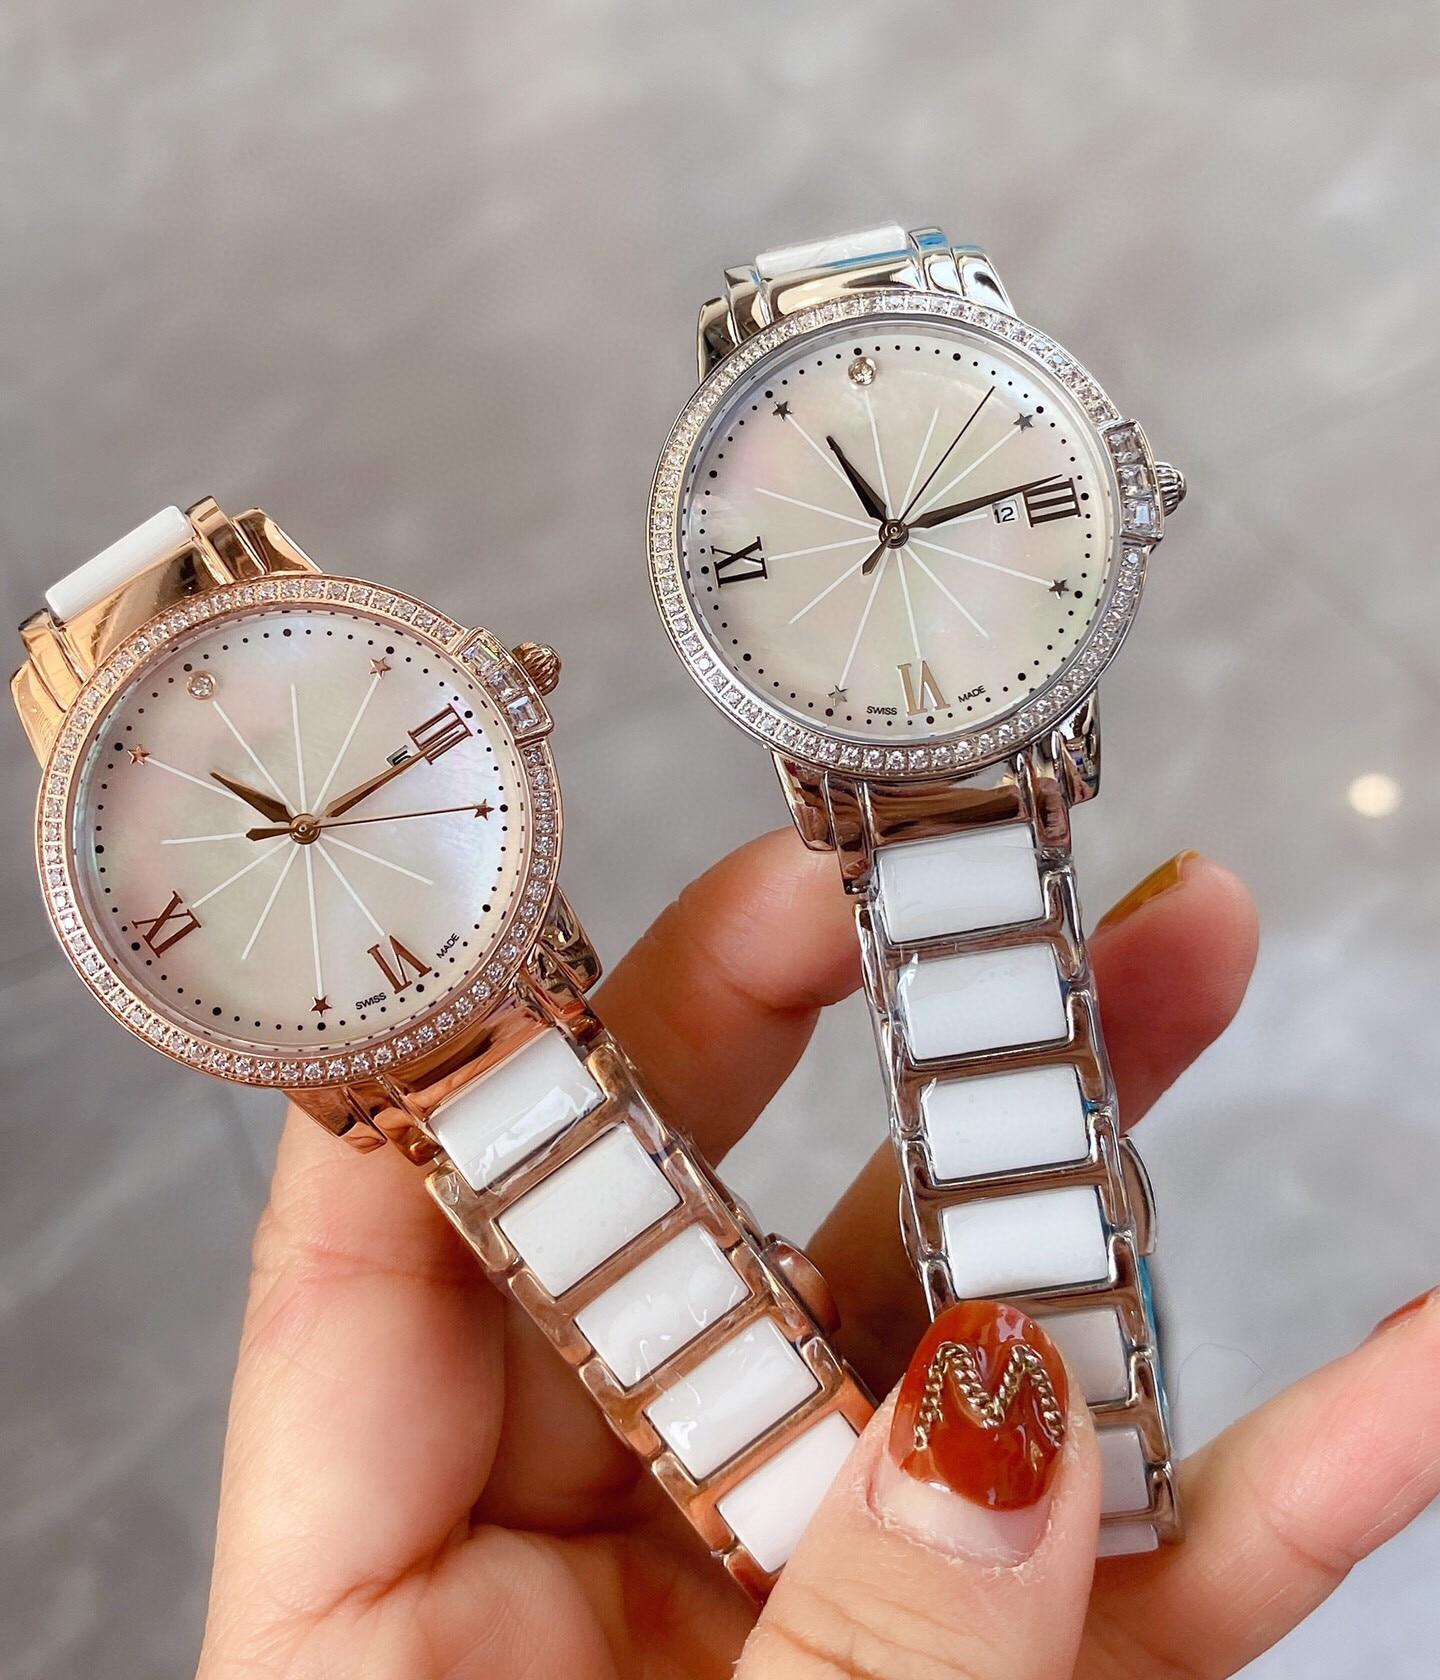 New Stainless steel geometric star watch ladies mother of pearl ceramic Wristwatch Luxury women roman number quartz clock 34mm